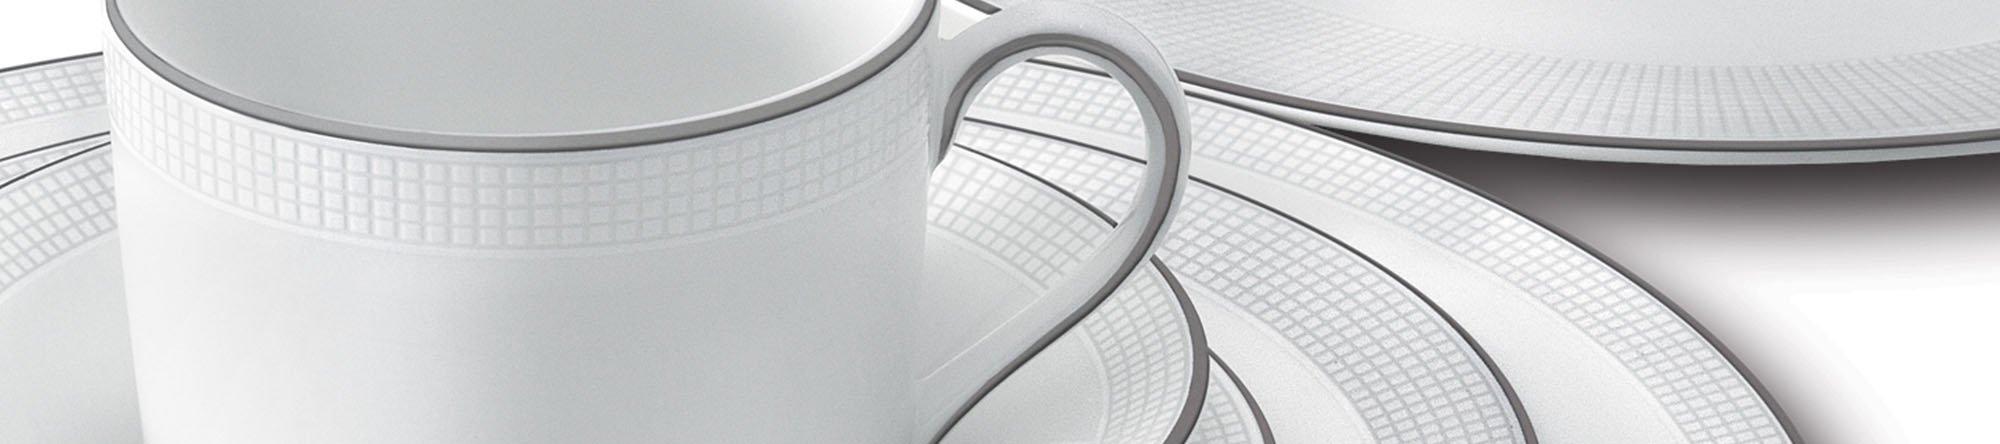 Vera Wang White Amp Platinum Formal Dinnerware Plate Sets